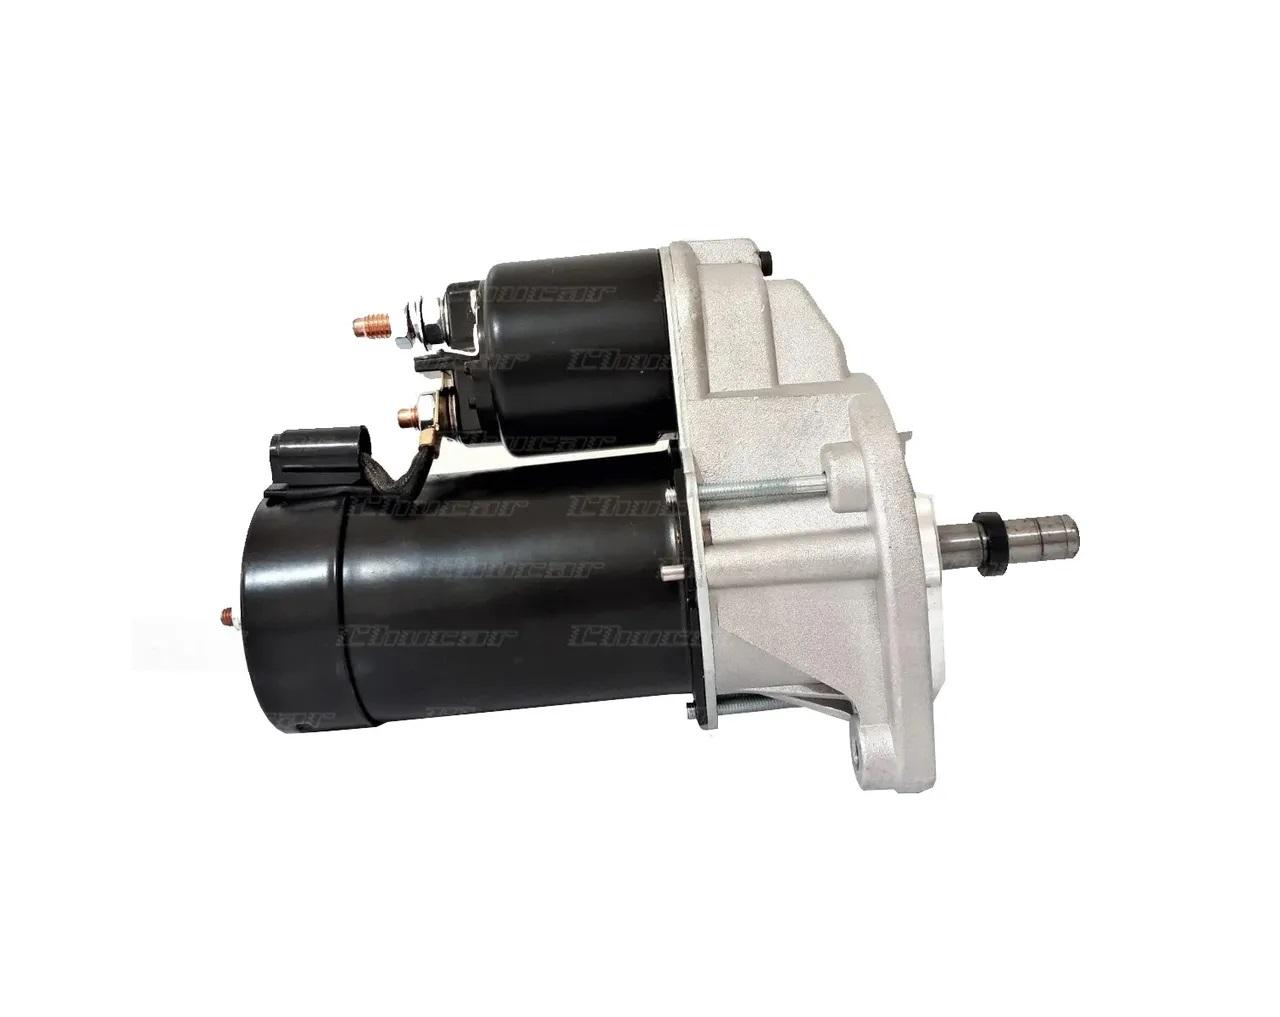 MOTOR PARTIDA SANTANA/GOL/PARATI - MOTOR  AP (TODOS) MOD. BOSCH - 12V